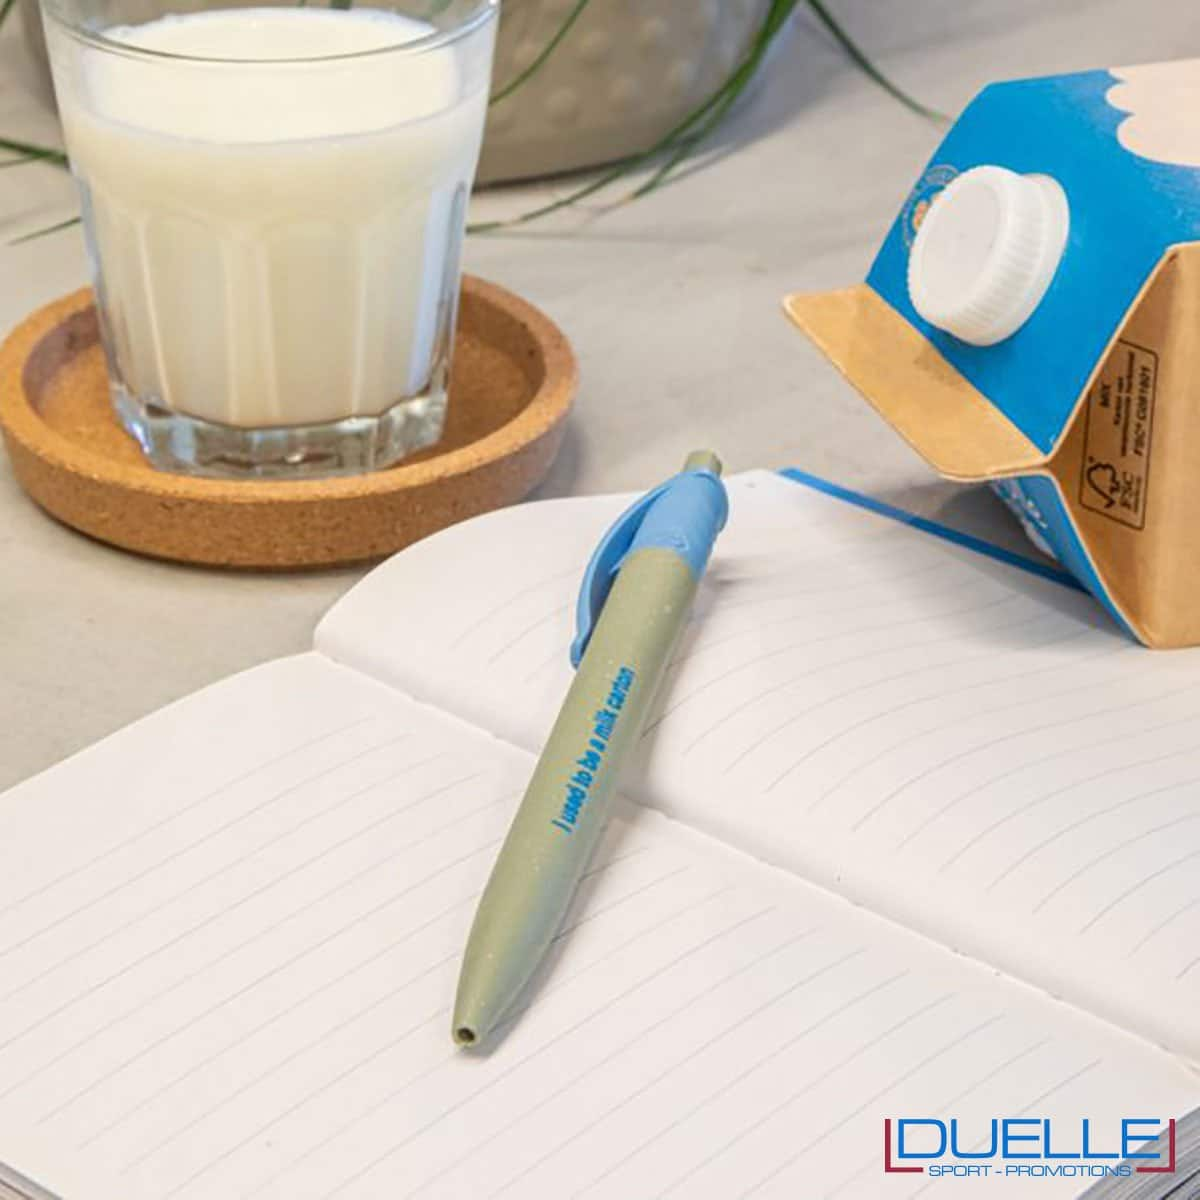 Penna in tetra pak su quaderno